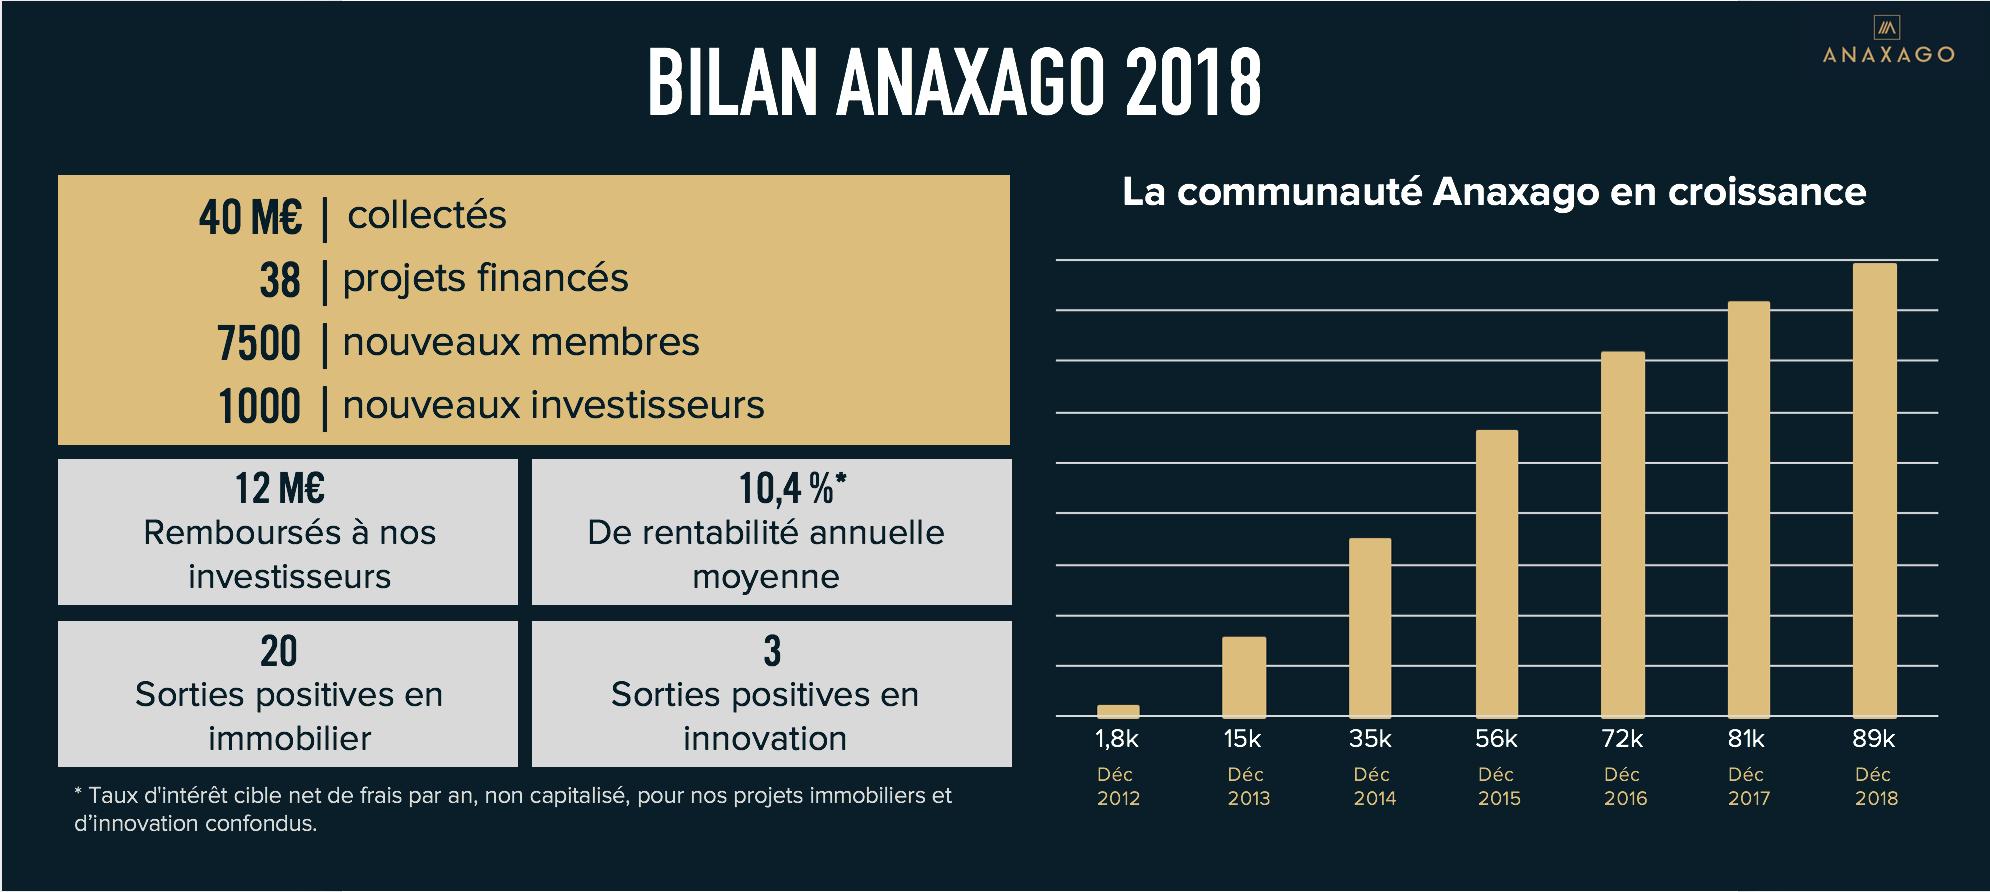 année 2018 crowdfunding anaxago